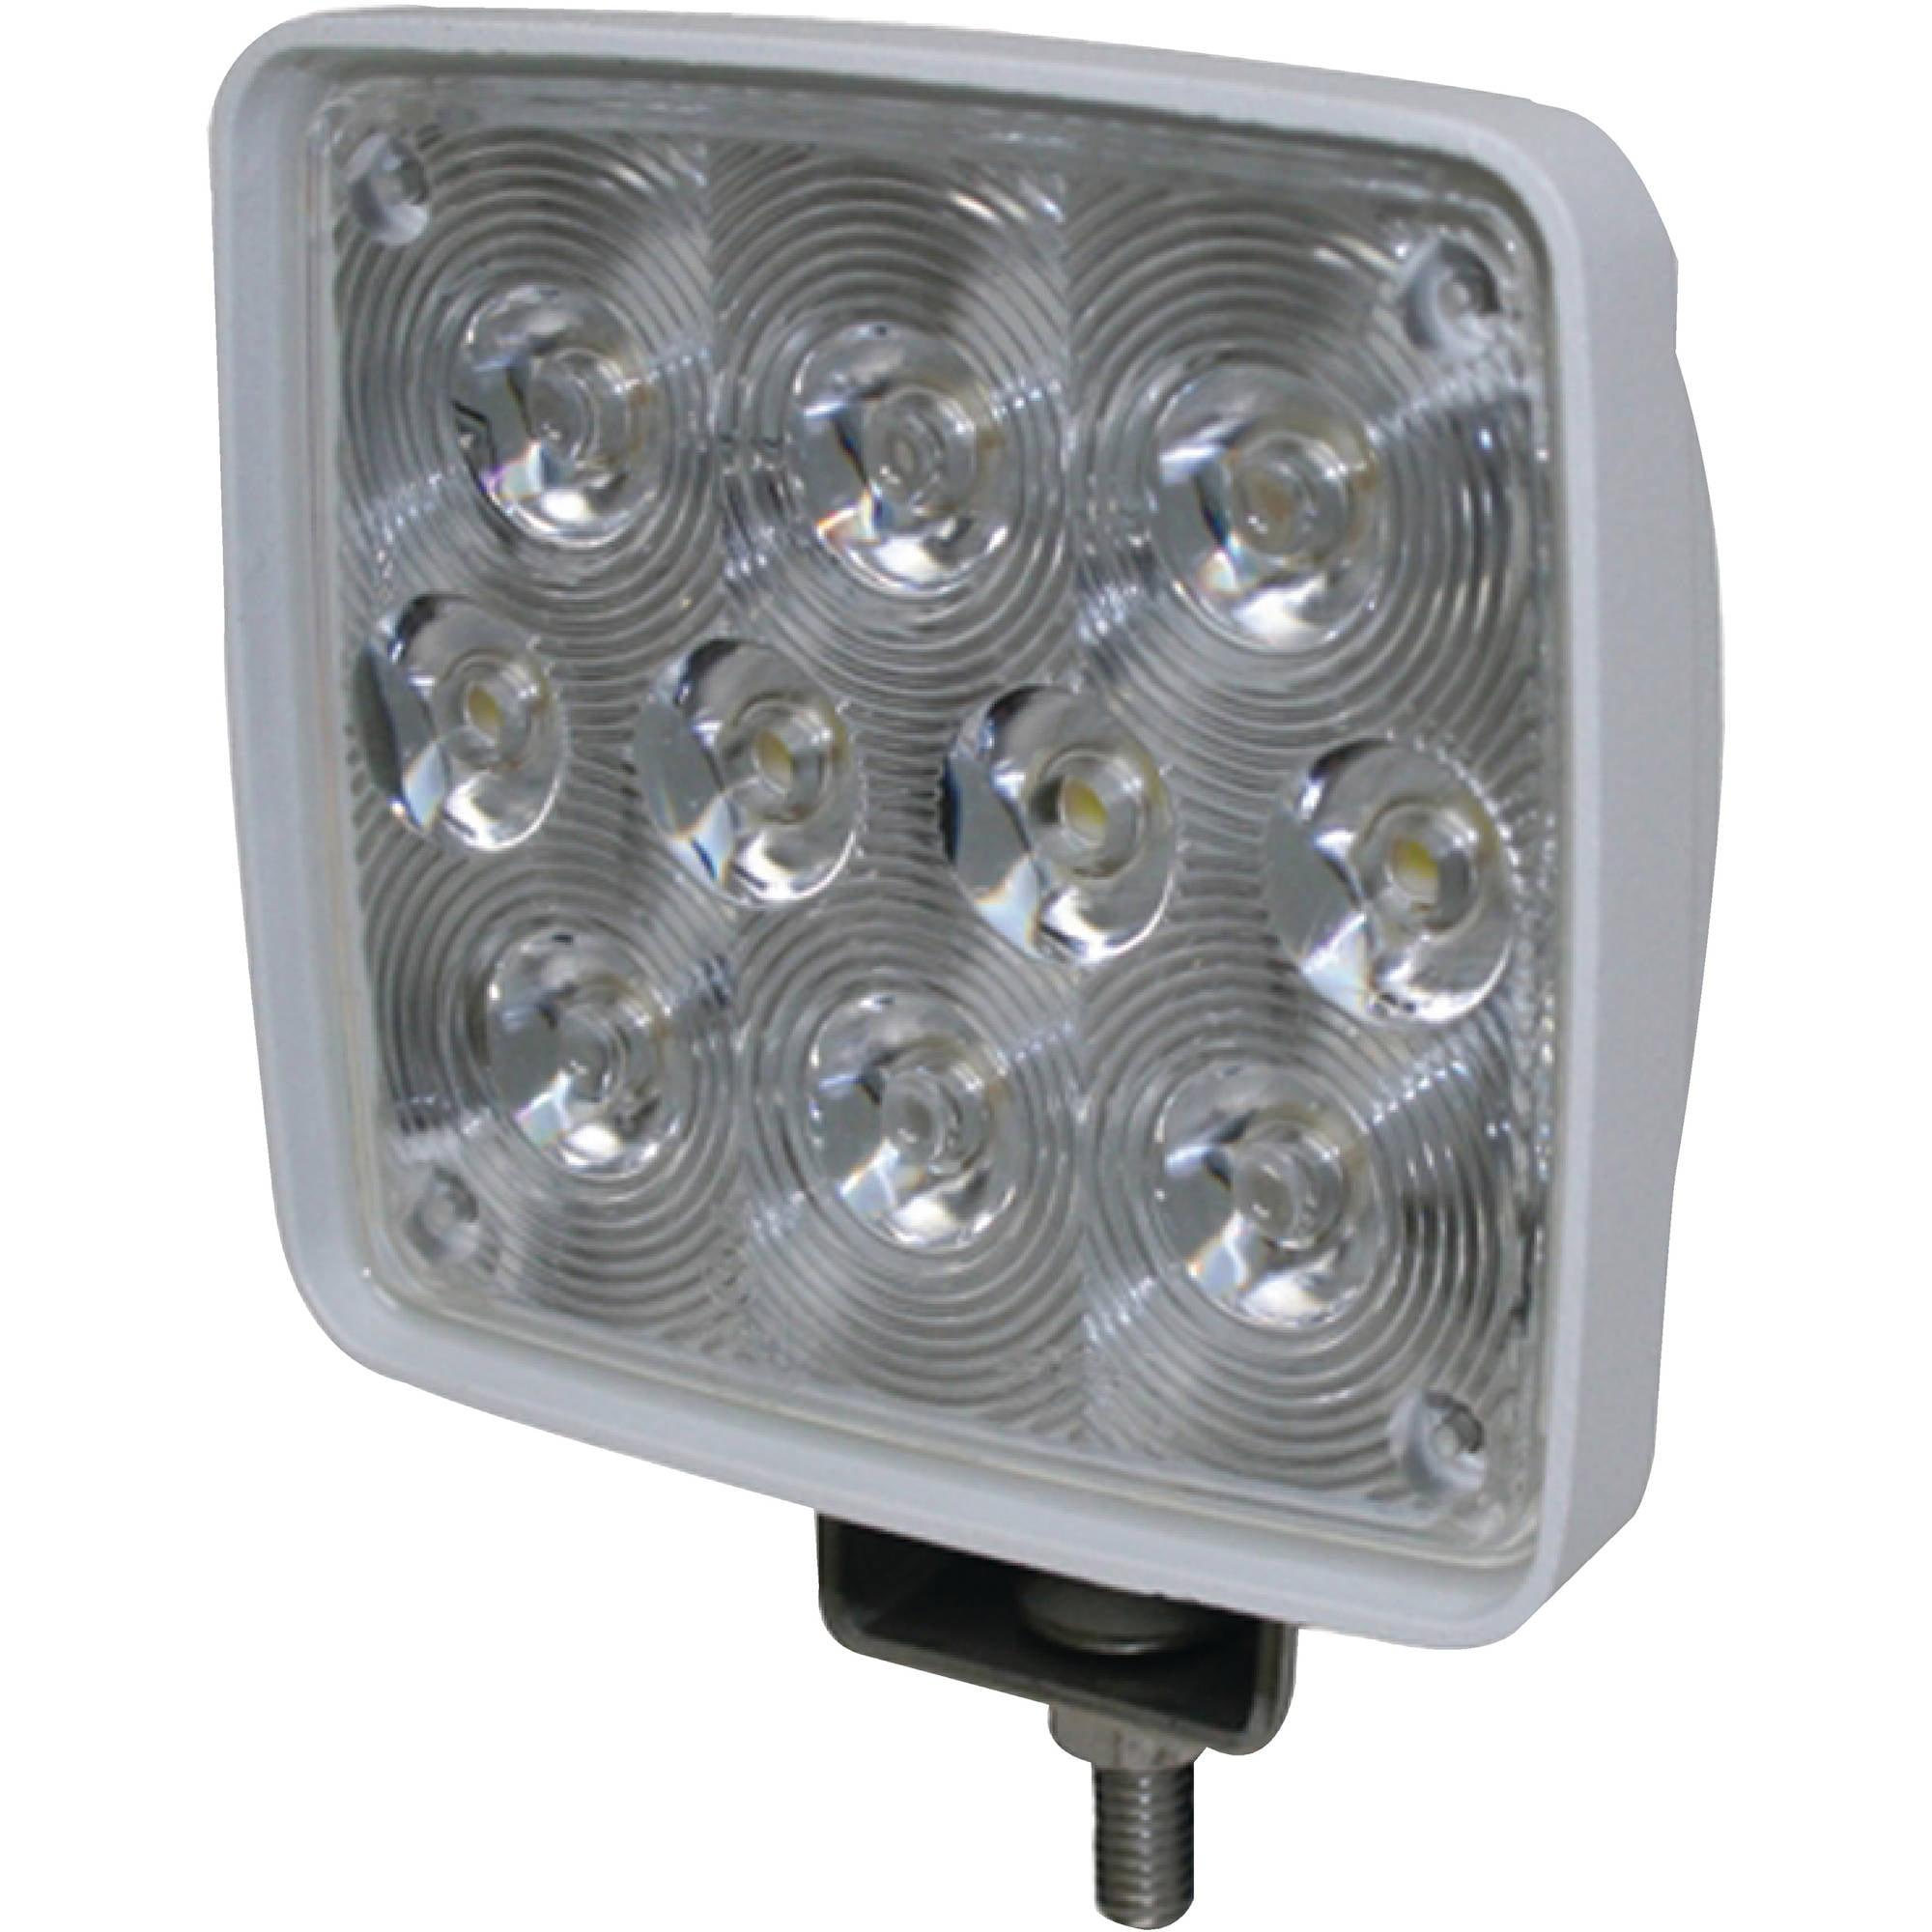 T-H Marine LED Spreader Light 10 LEDs, White Housing by T-H Marine Supplies